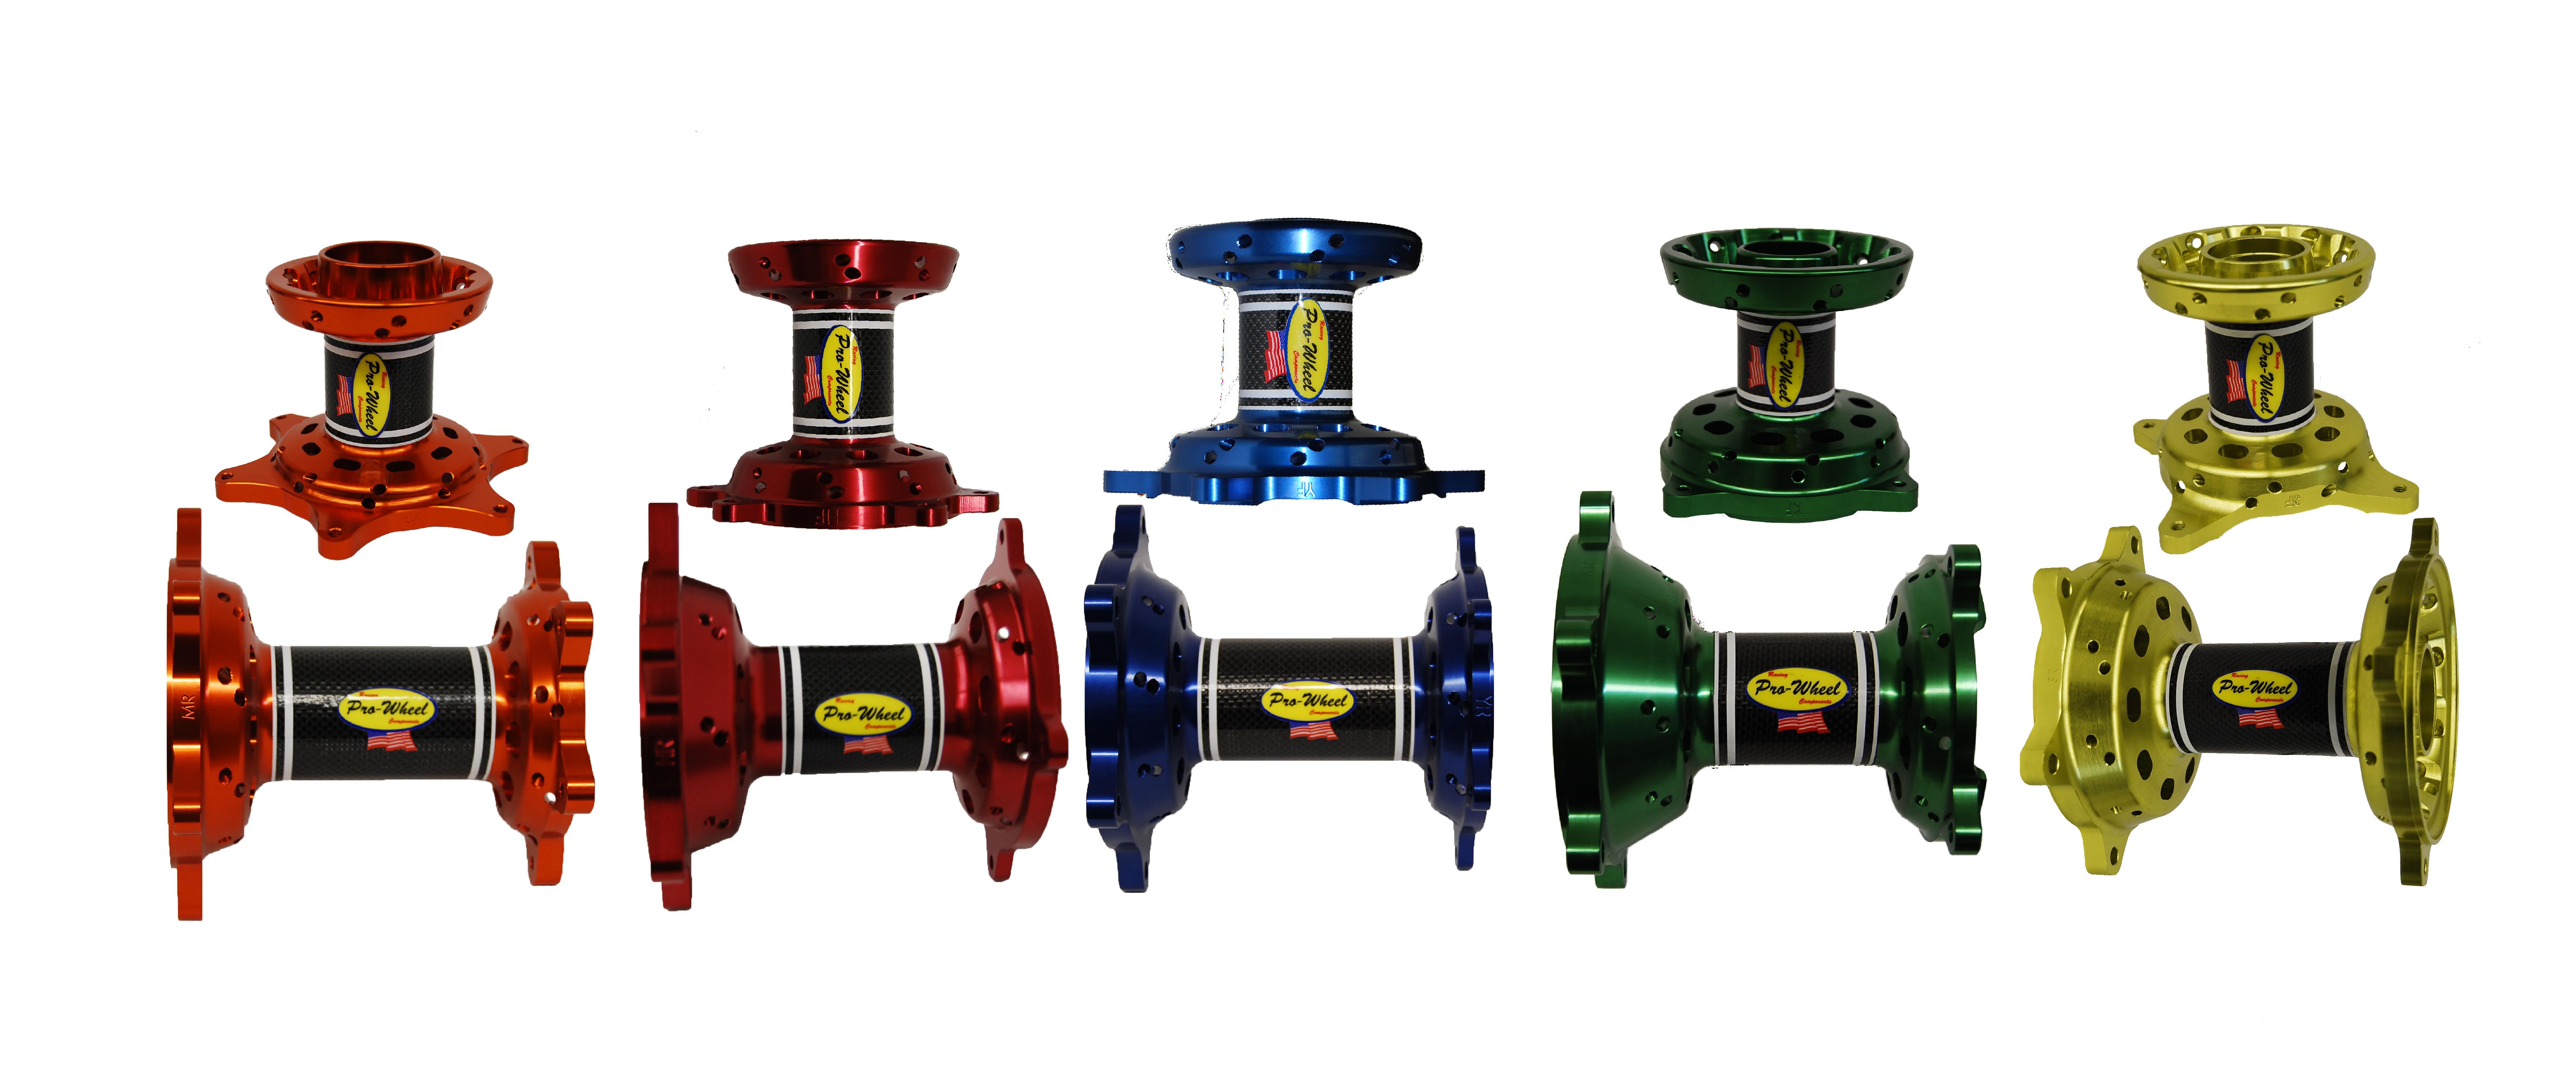 Pro-Wheel Racing Components